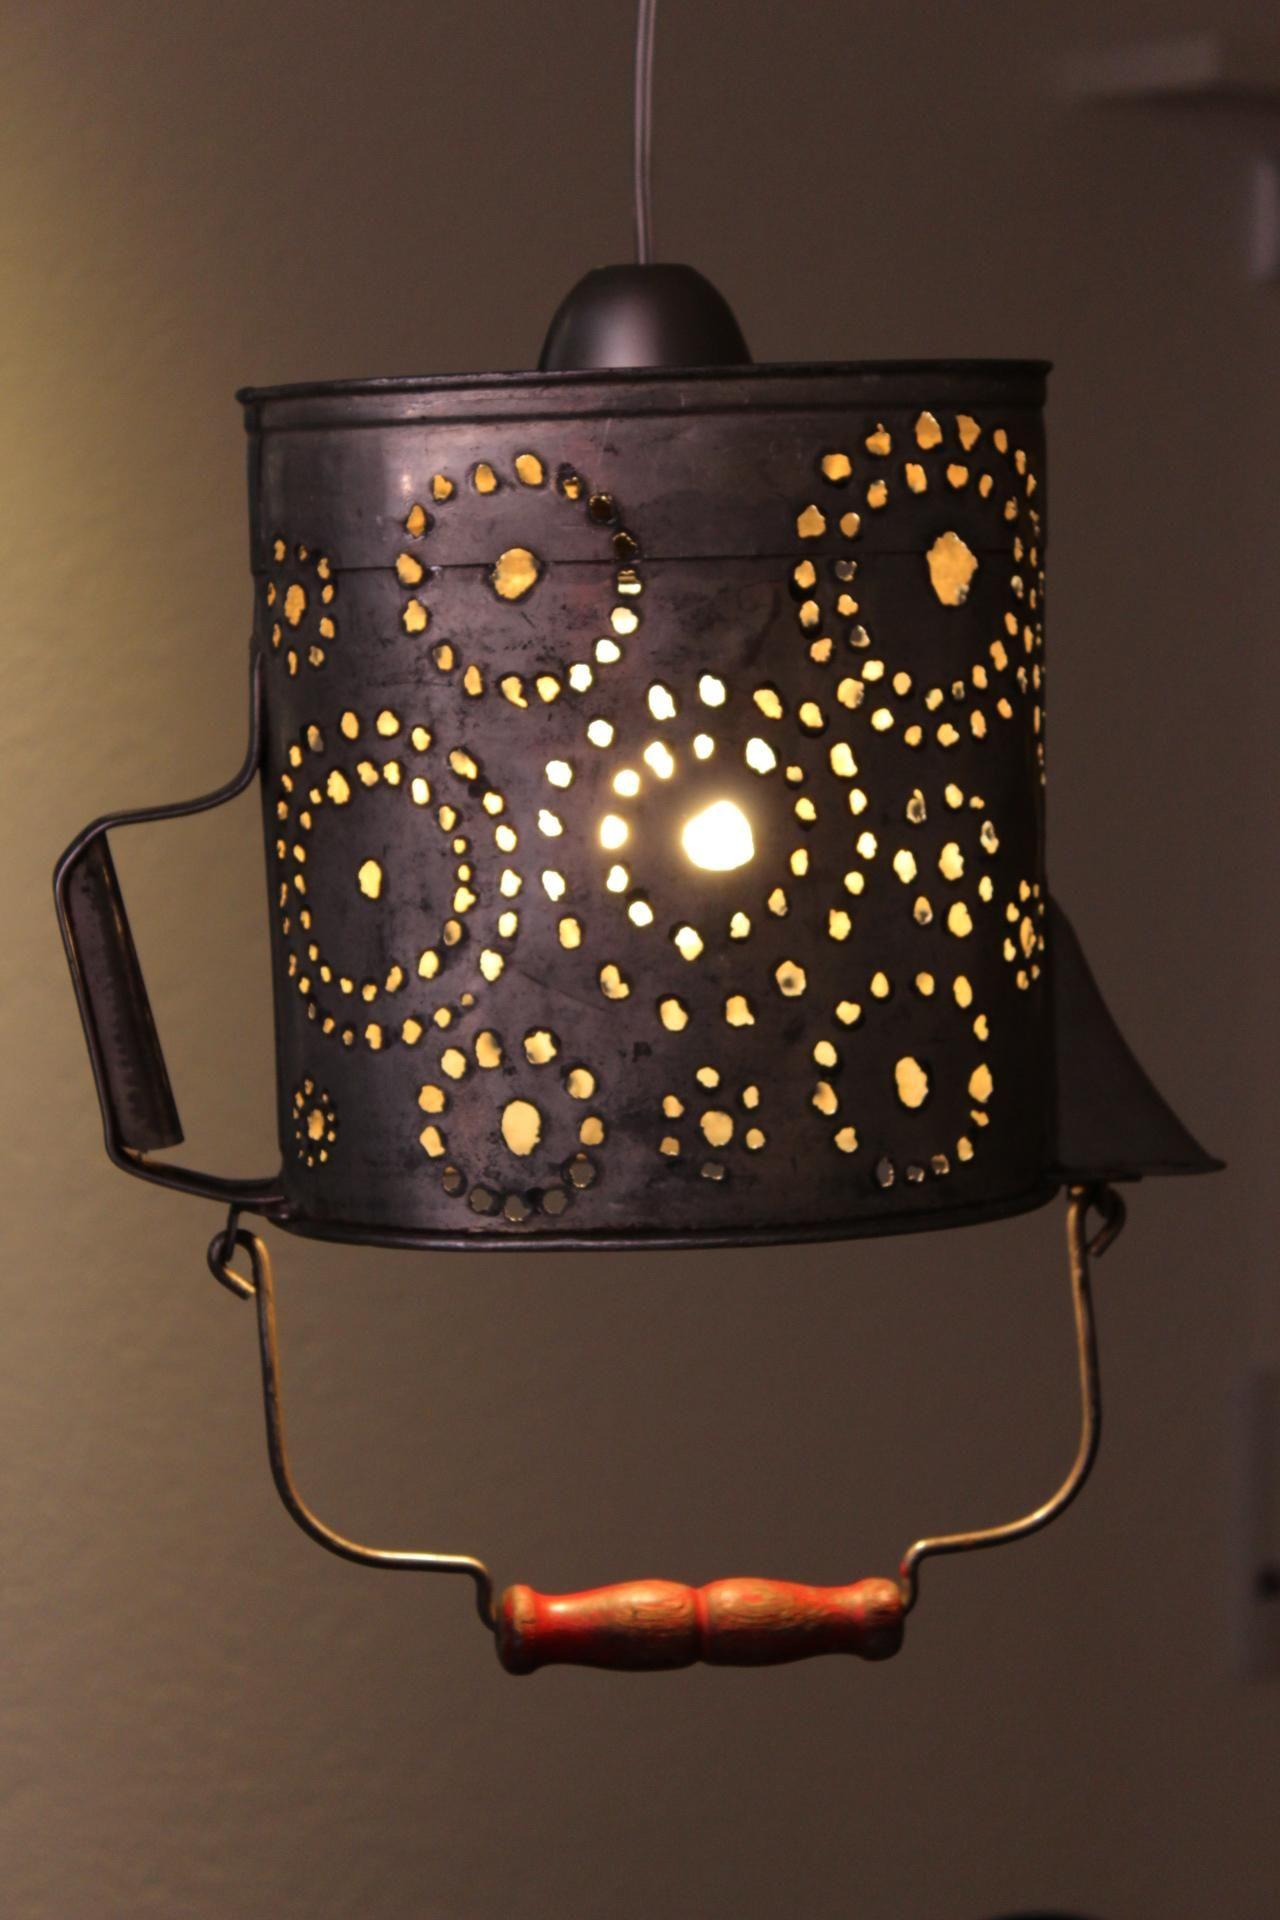 kanne mit plasmaschneider zu deckenlampe umgebaut old can repurposed as lamp with plasmacut. Black Bedroom Furniture Sets. Home Design Ideas